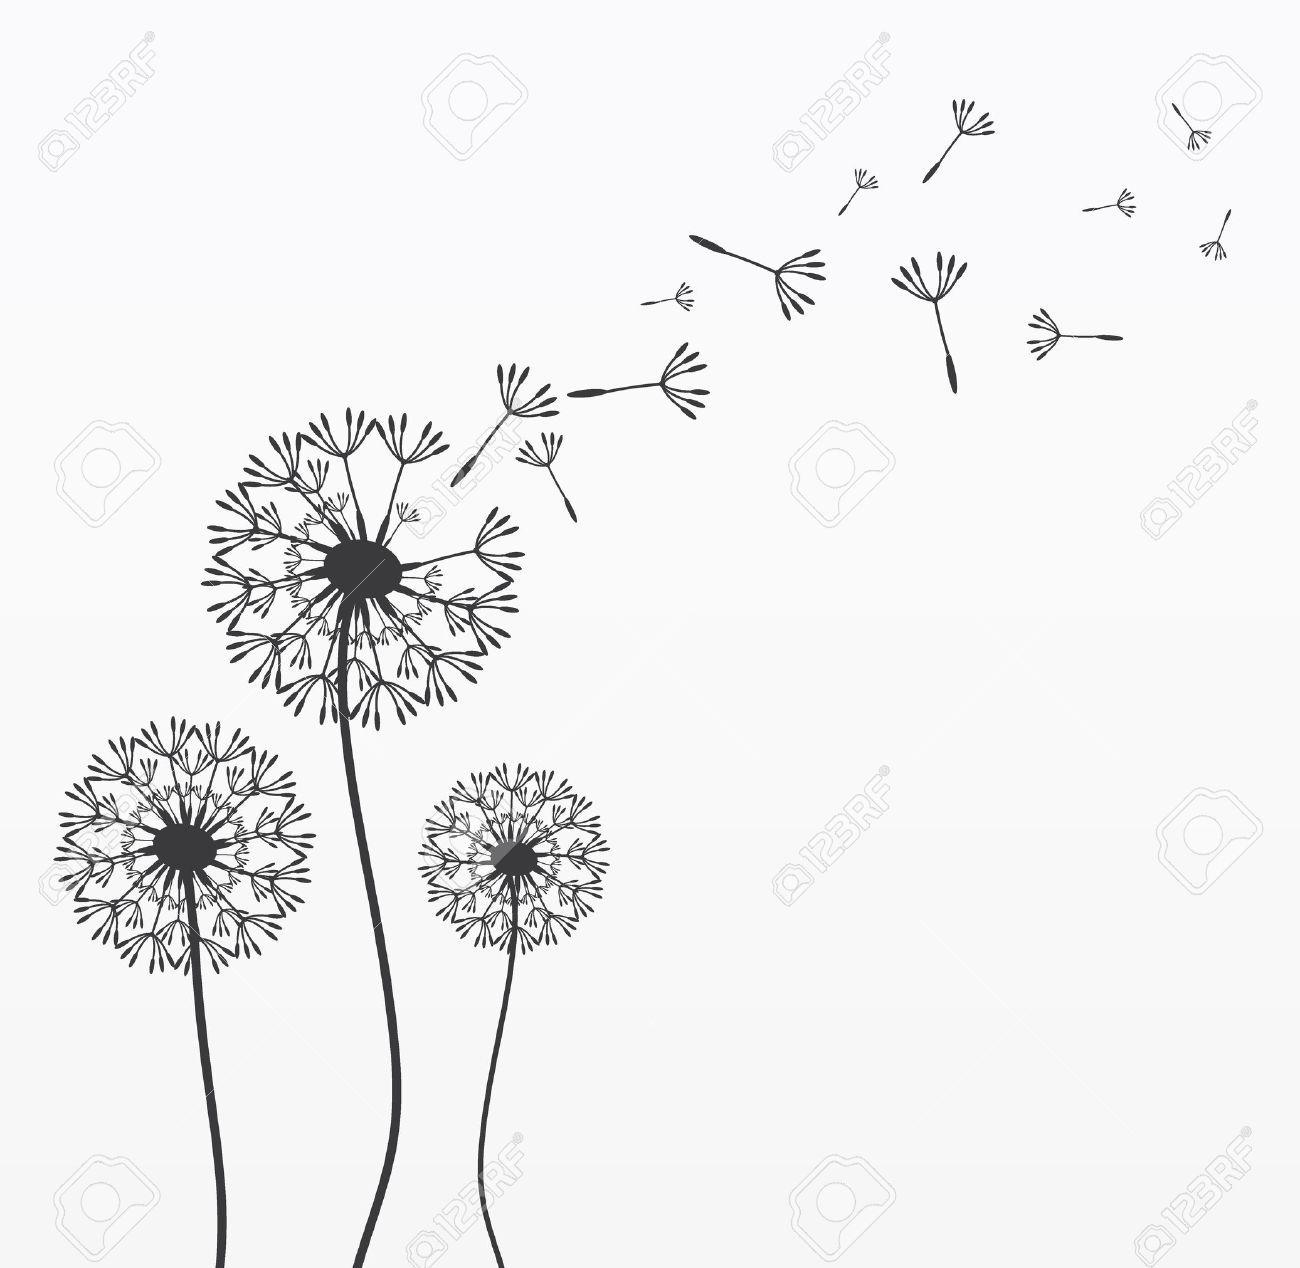 Black and white dandelion clipart 6 » Clipart Portal.